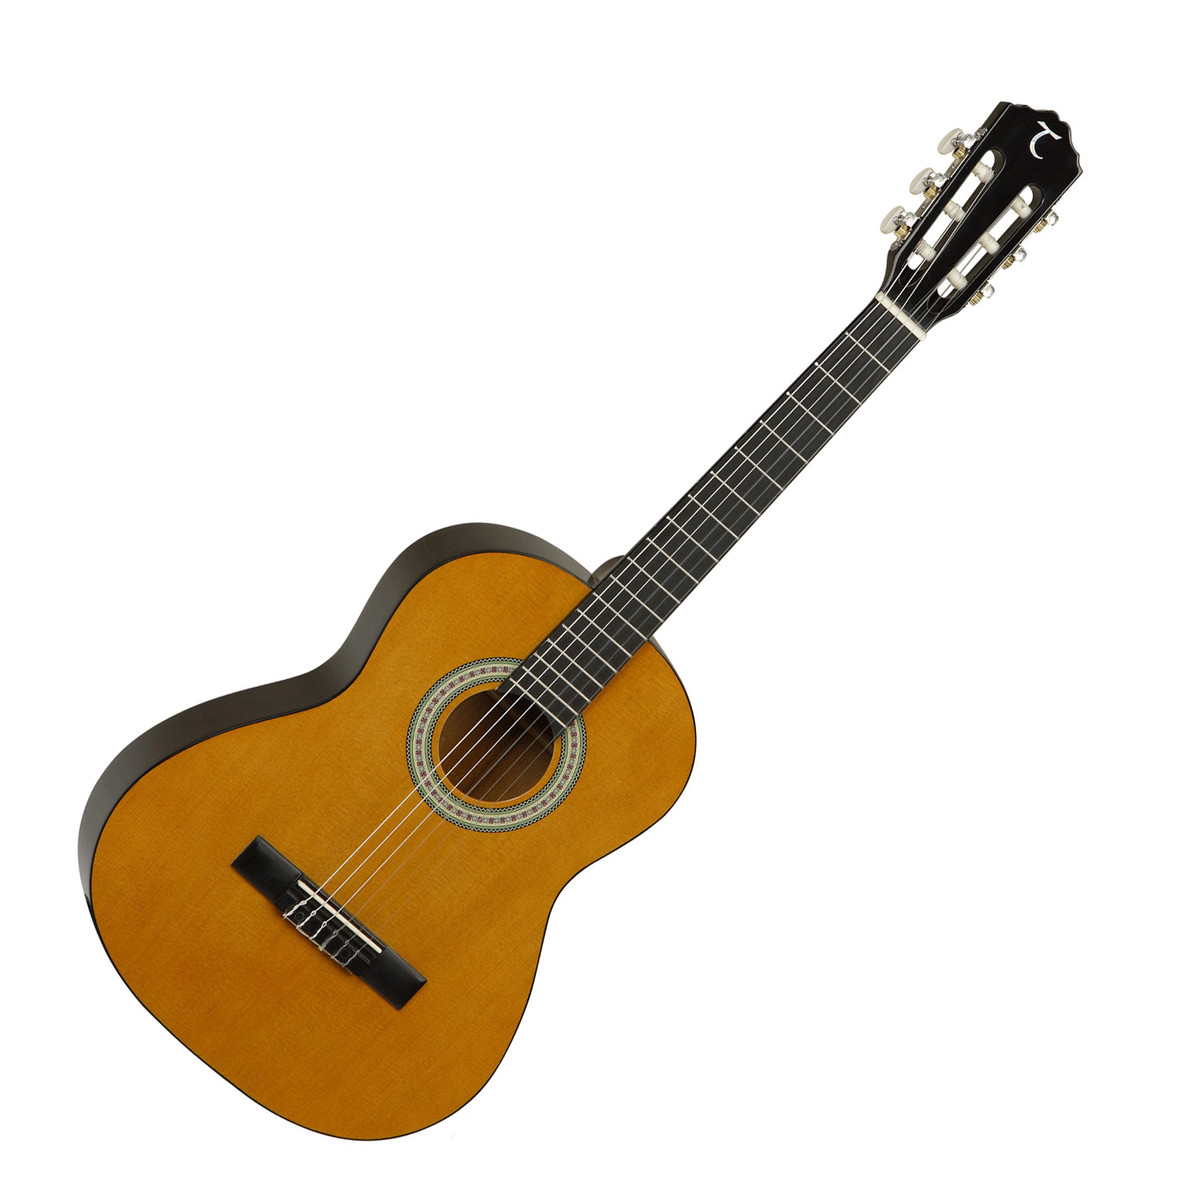 tanglewood guitare classique 3 4 naturel. Black Bedroom Furniture Sets. Home Design Ideas